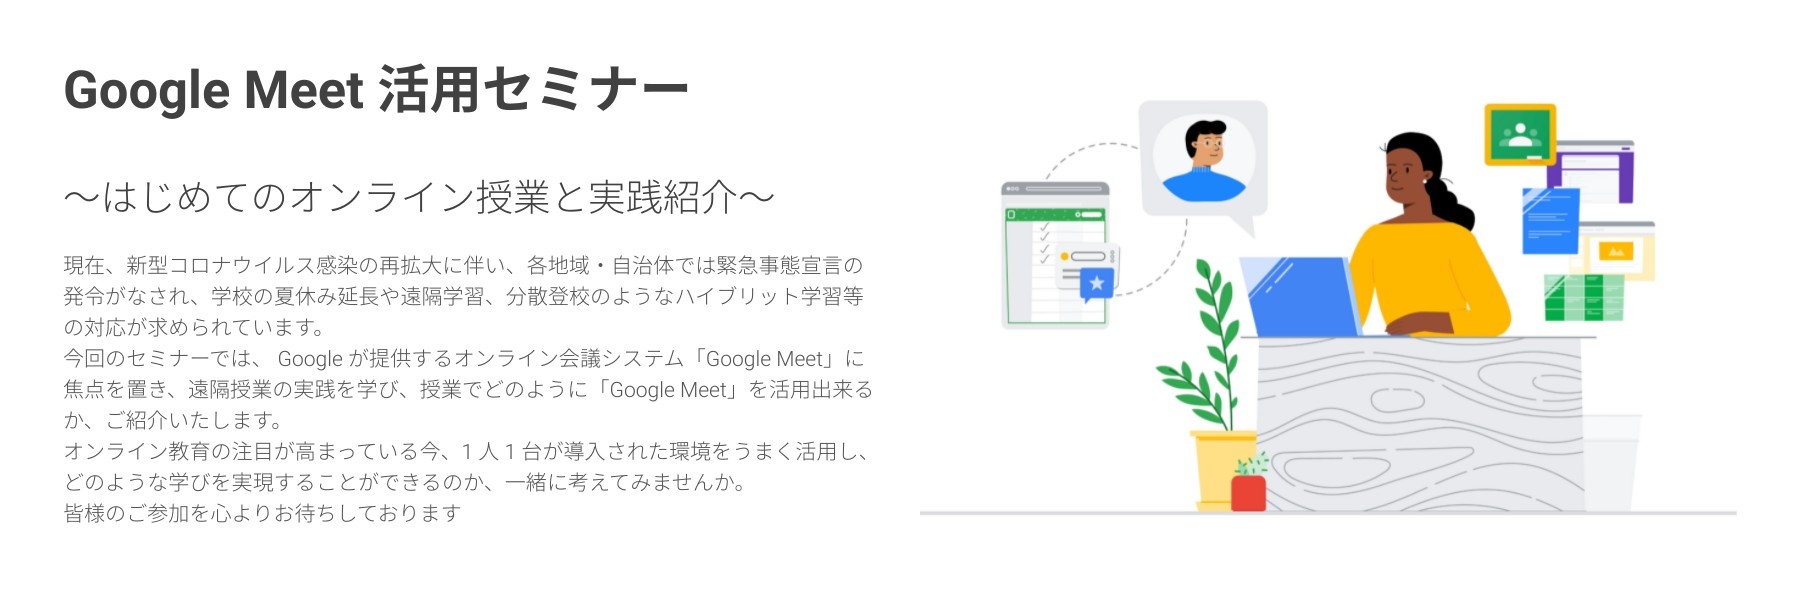 [Google for Educatio] Google Meet 活用セミナー 〜はじめてのオンライン授業と実践紹介〜